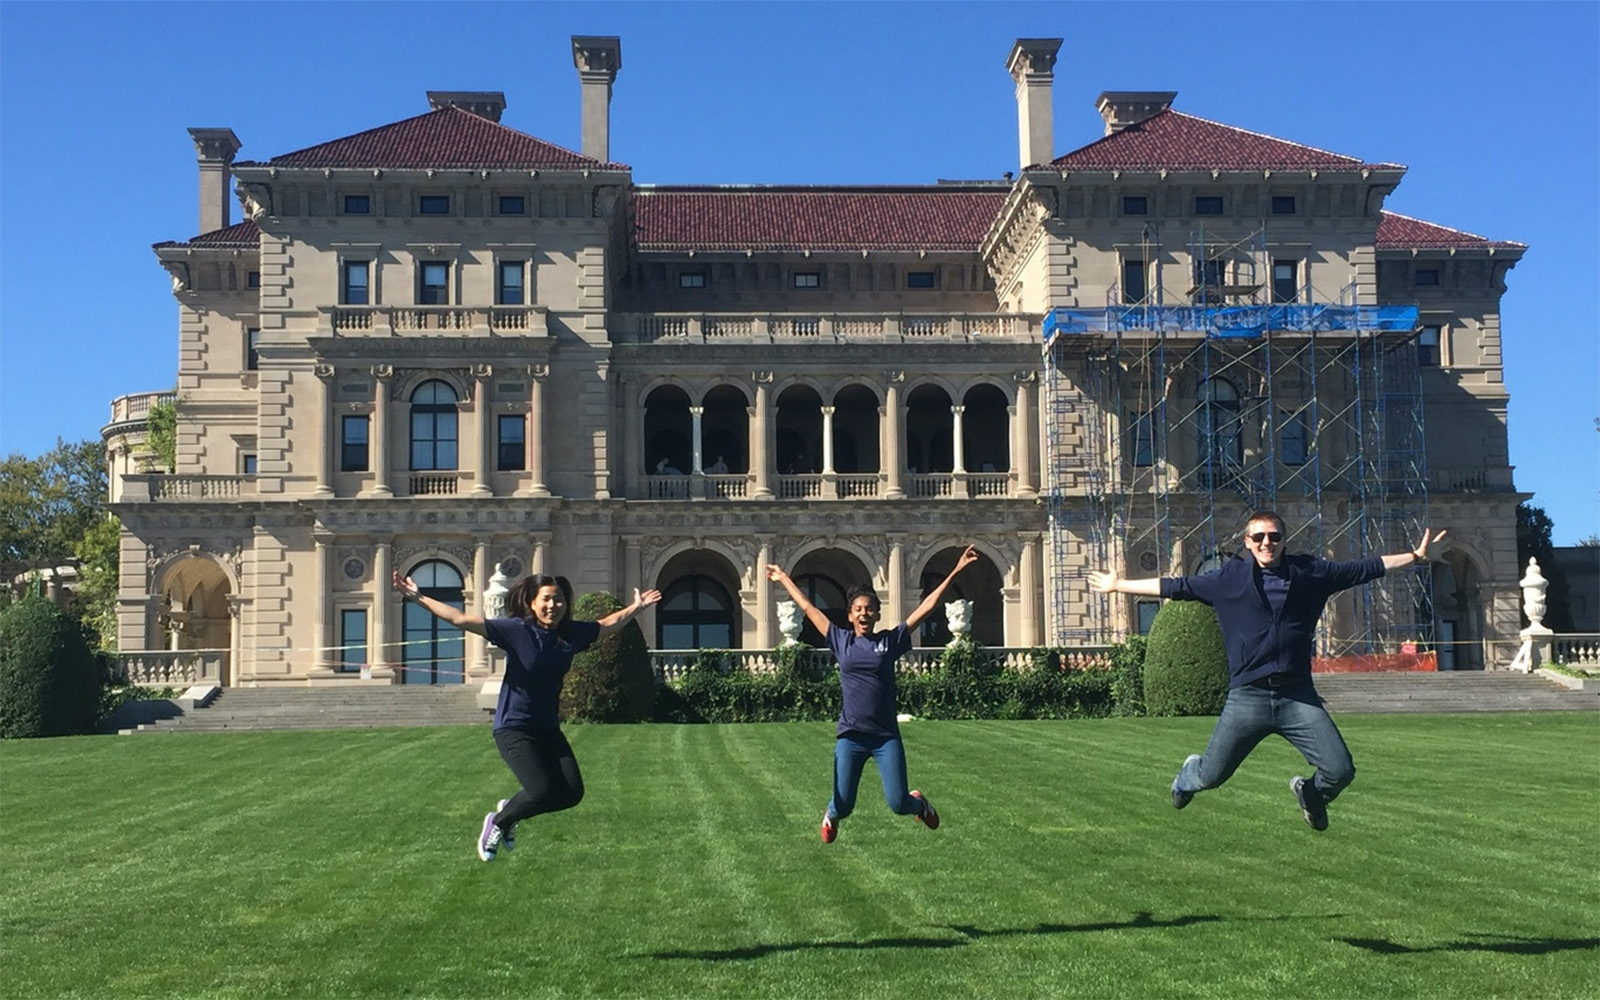 From left: Sopanha Mao, San Diego State University; Hlobile Jele, University of Johannesburg; Joshua Groh, Purdue University. (UConn School of Business)